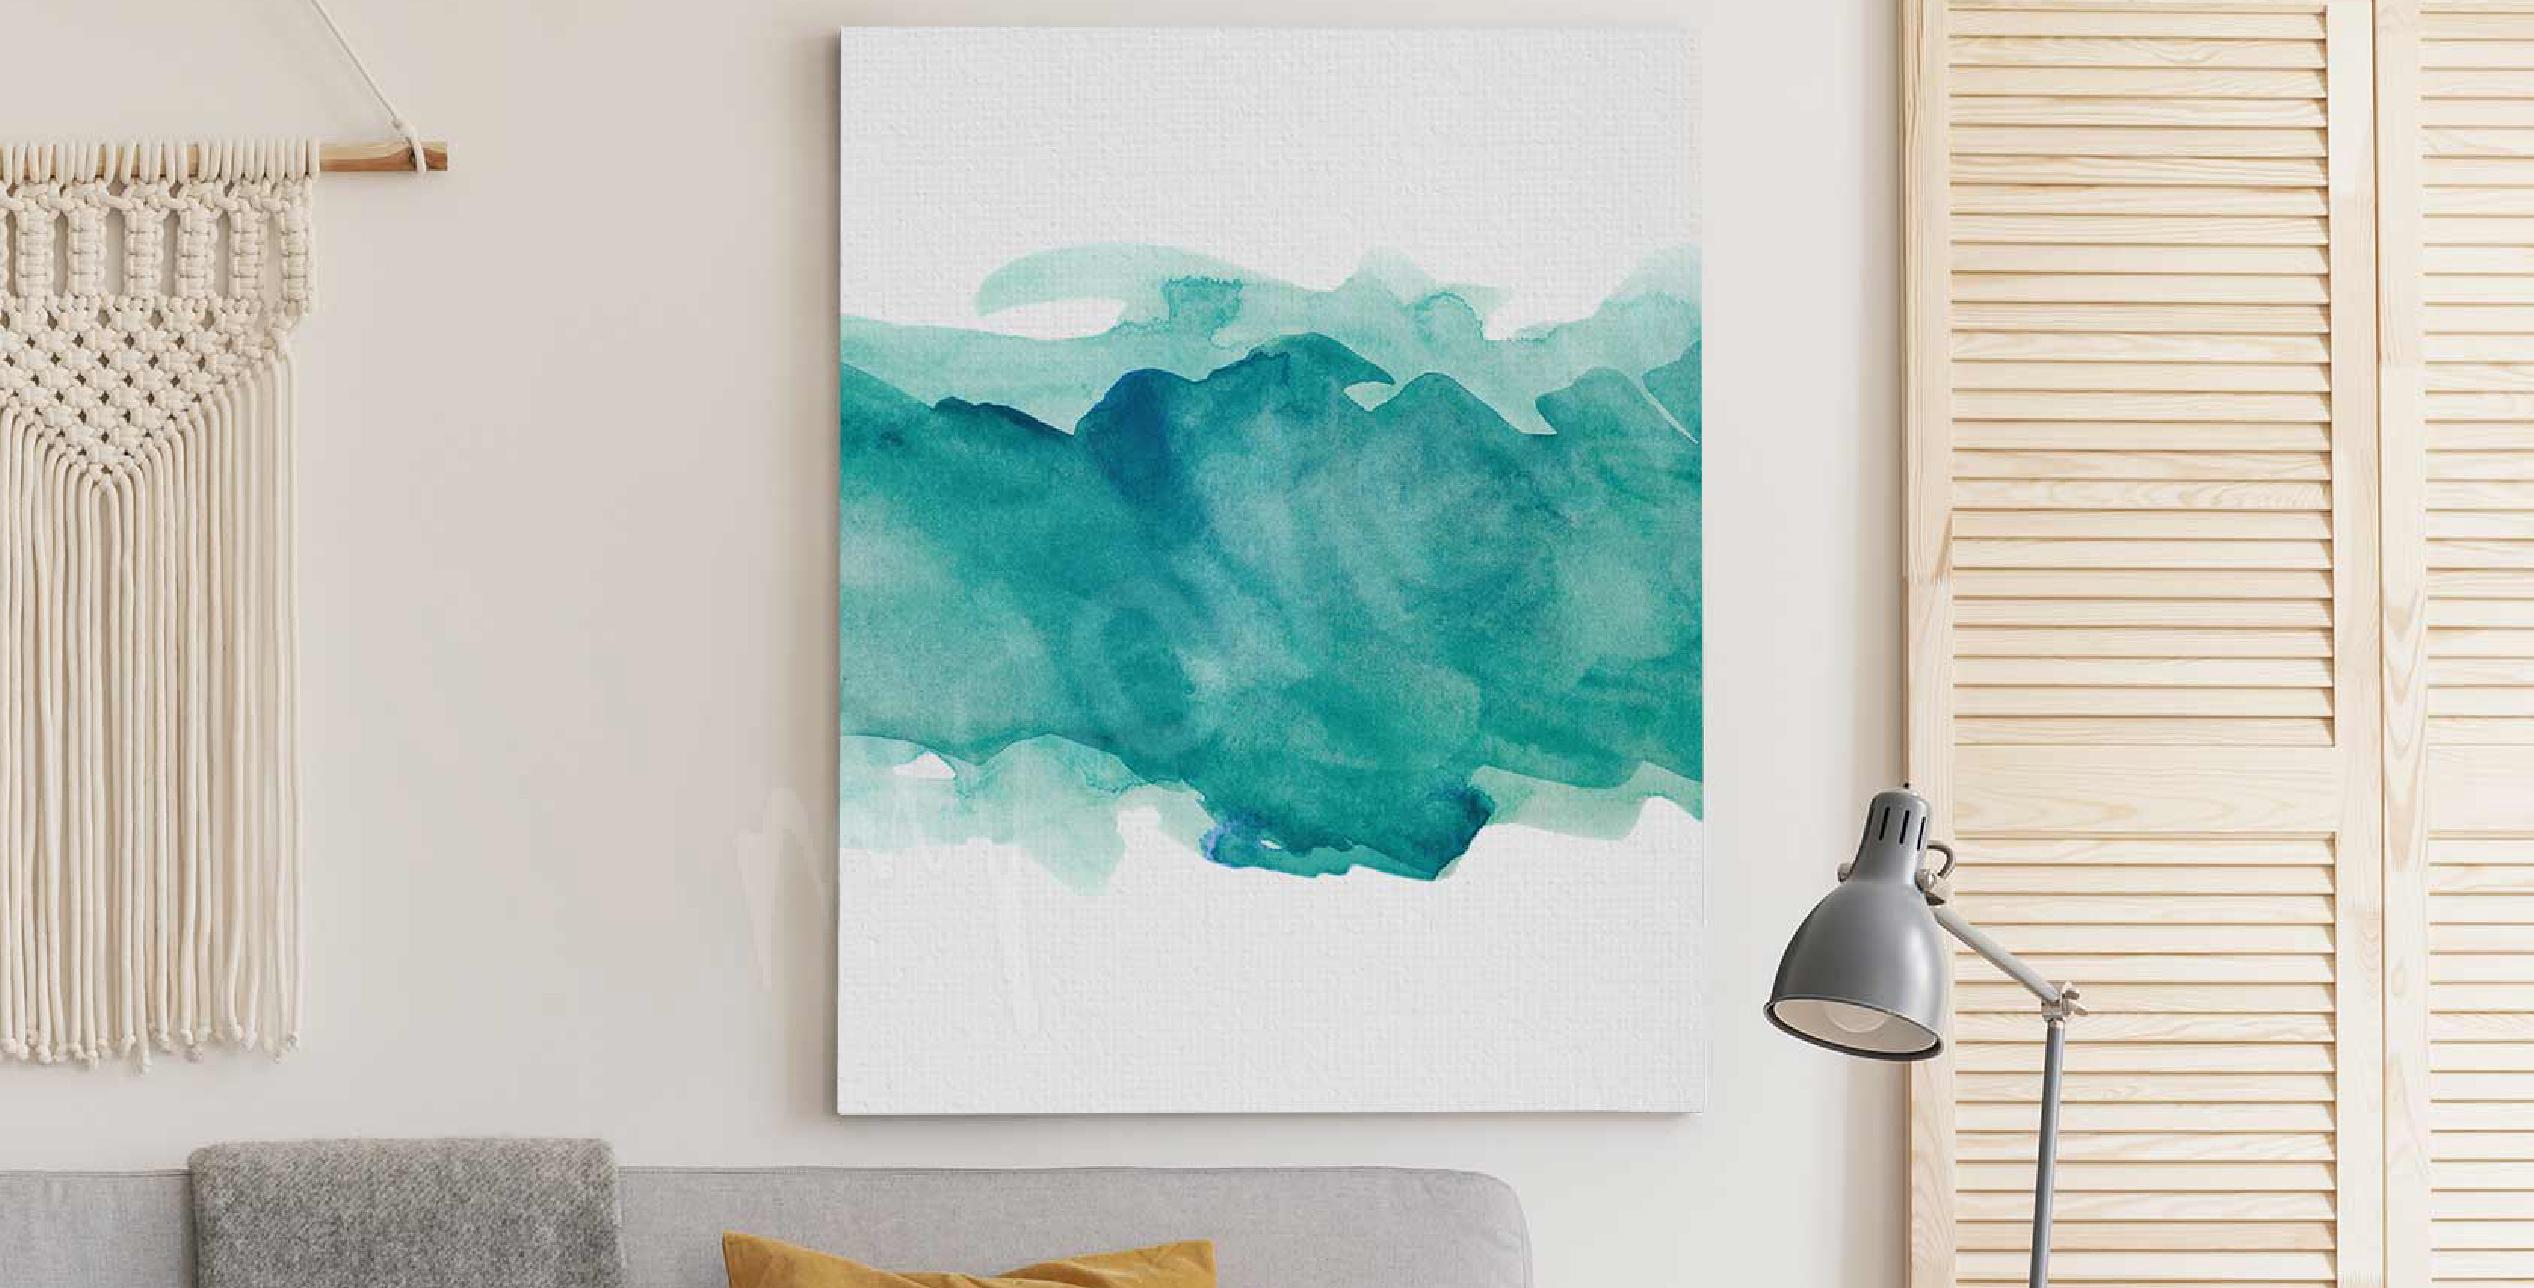 Image aquarelle aigue-marine